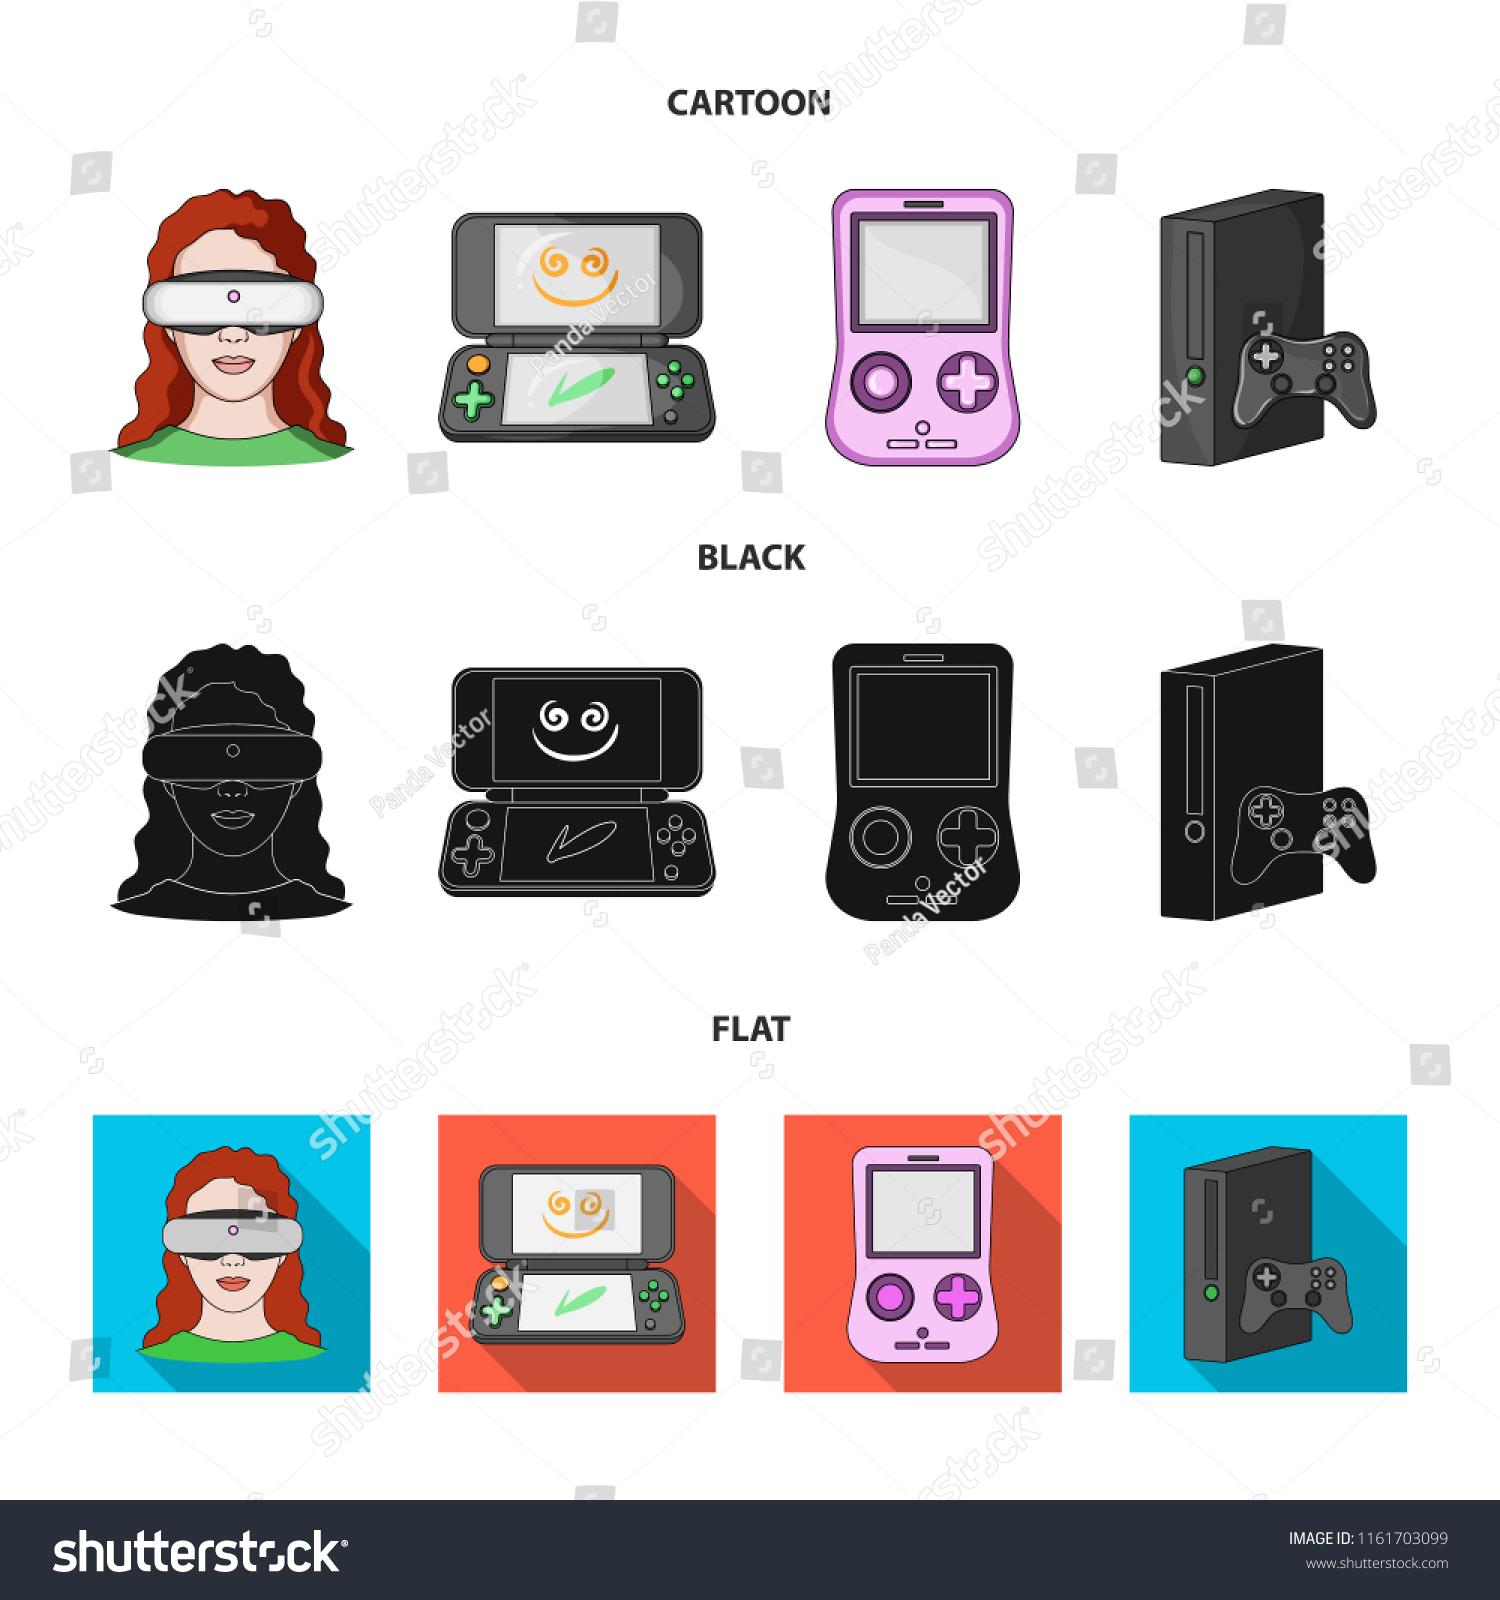 8a578847bdda Game Console Virtual Reality Cartoonblackflat Icons Stock Vector ...